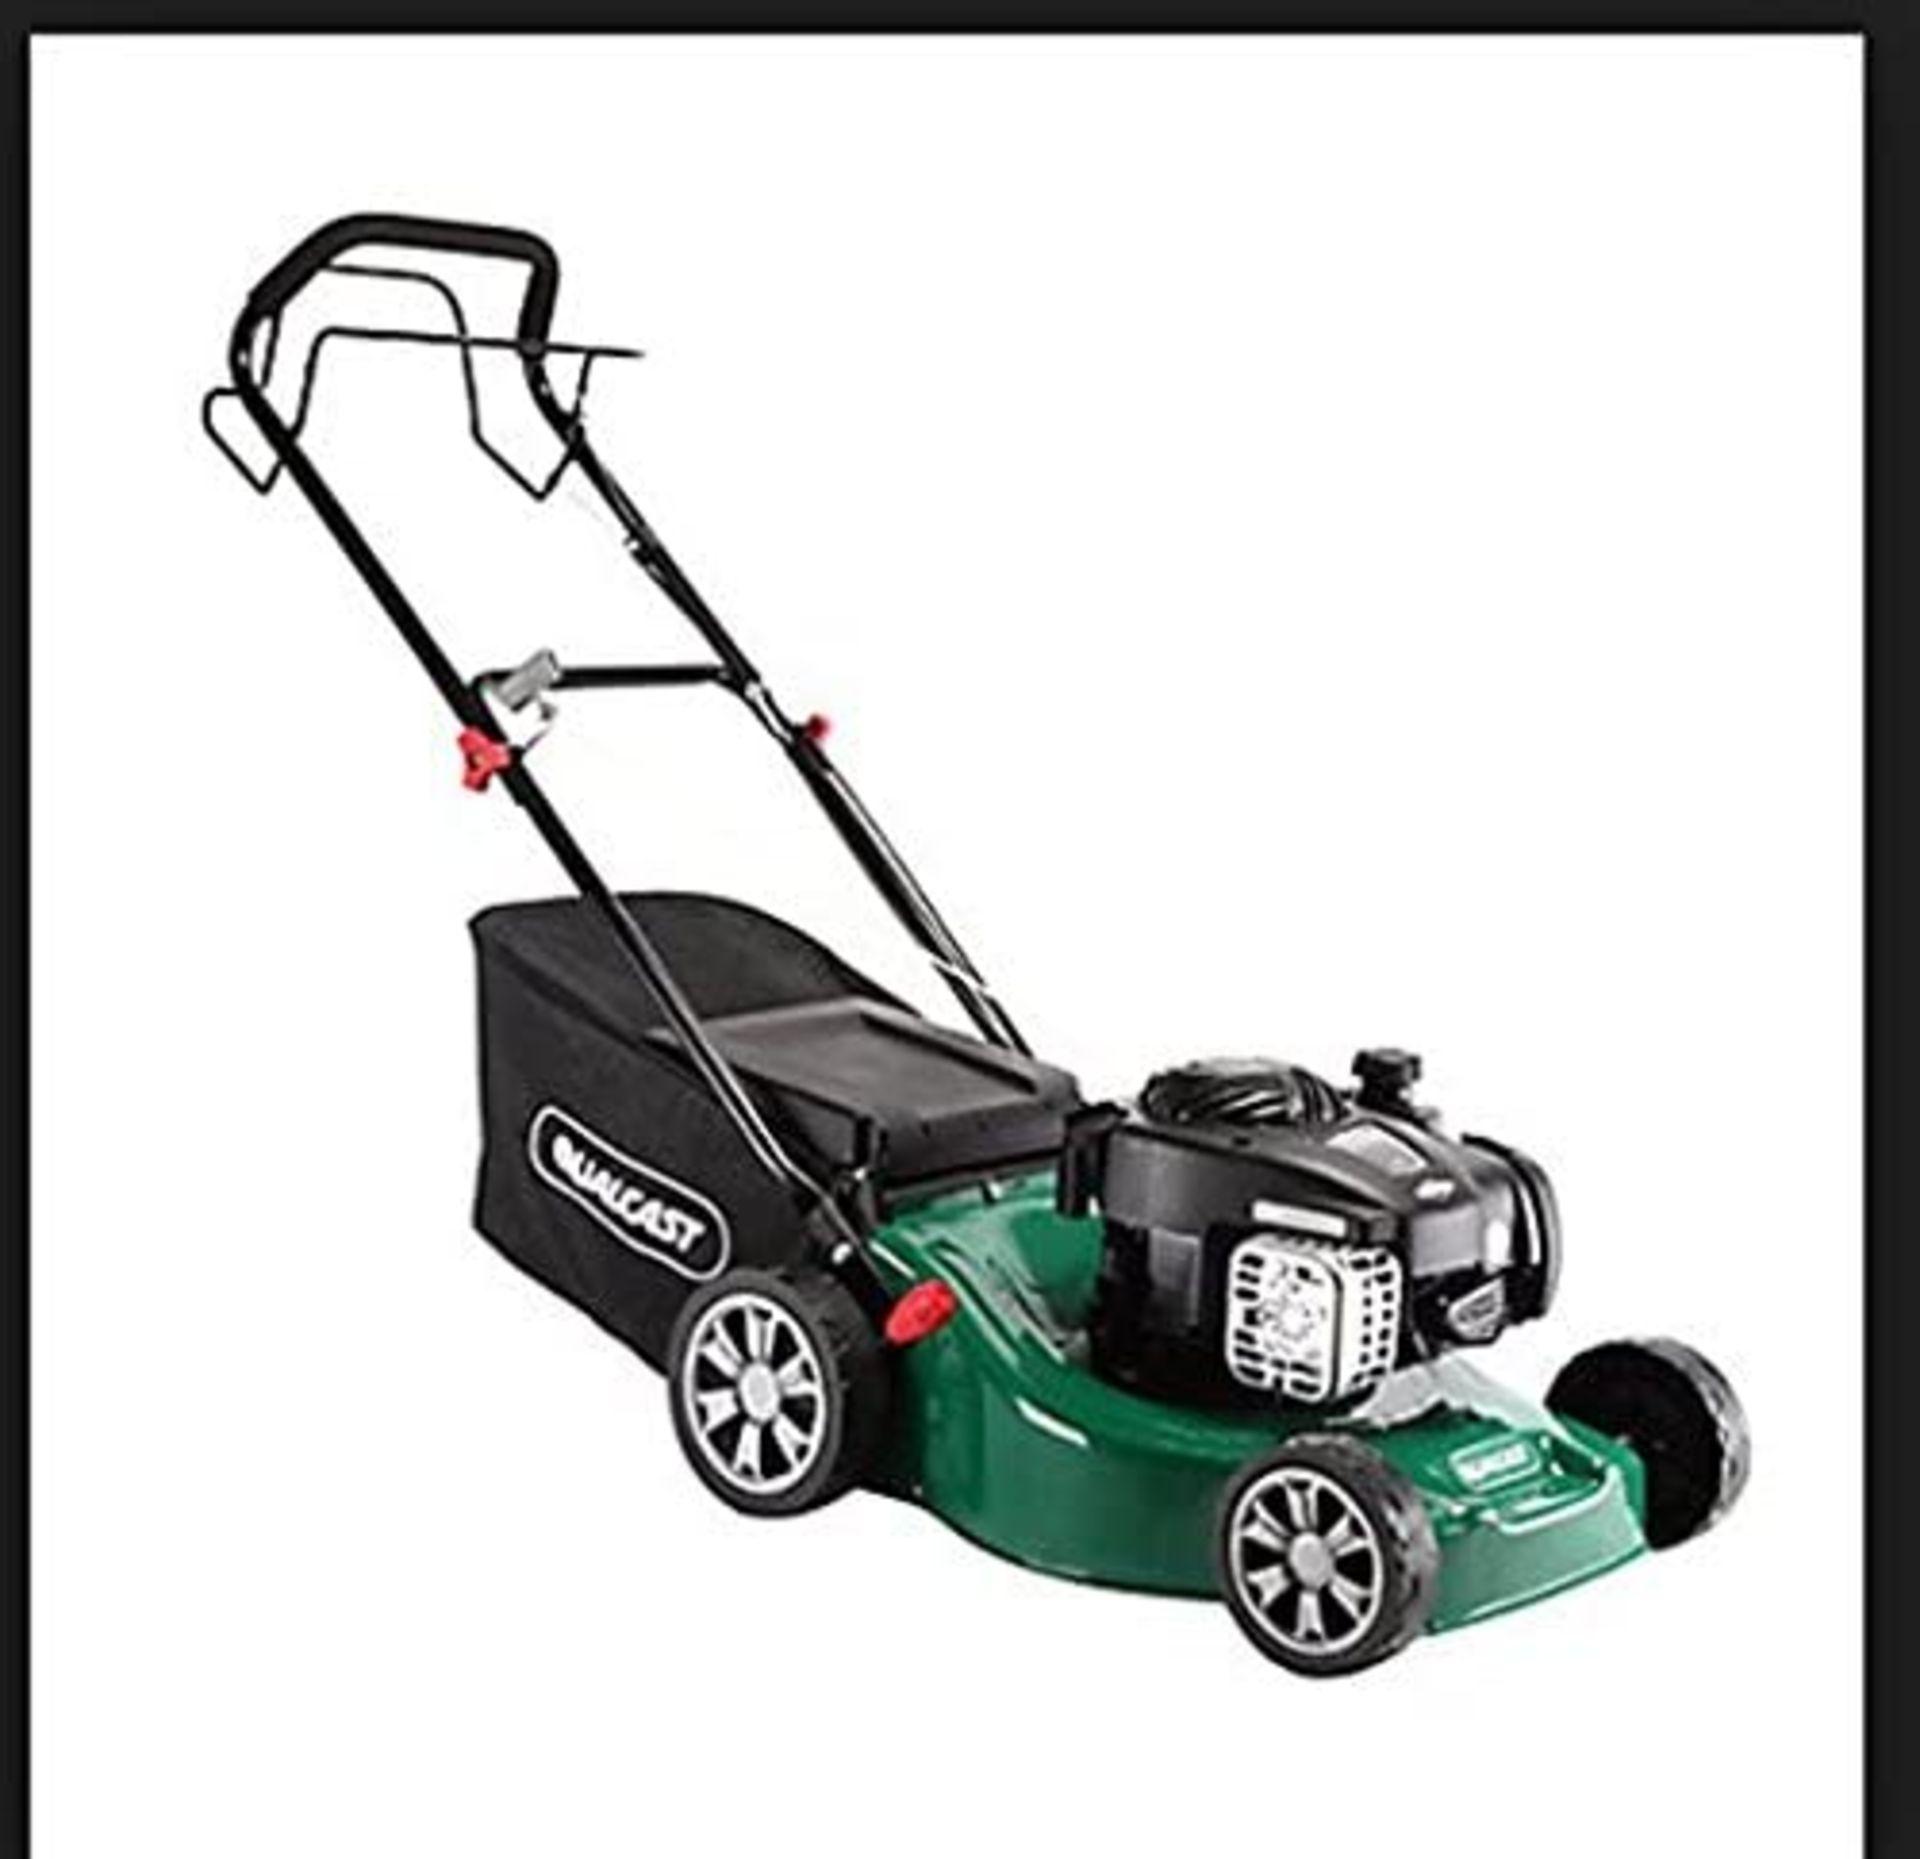 (P5) 1x Powerbase 41cm 125cc Pish Petrol Rotary Lawn Mower. RRP £199.00. Unit Is Clean, Appears N - Image 2 of 5